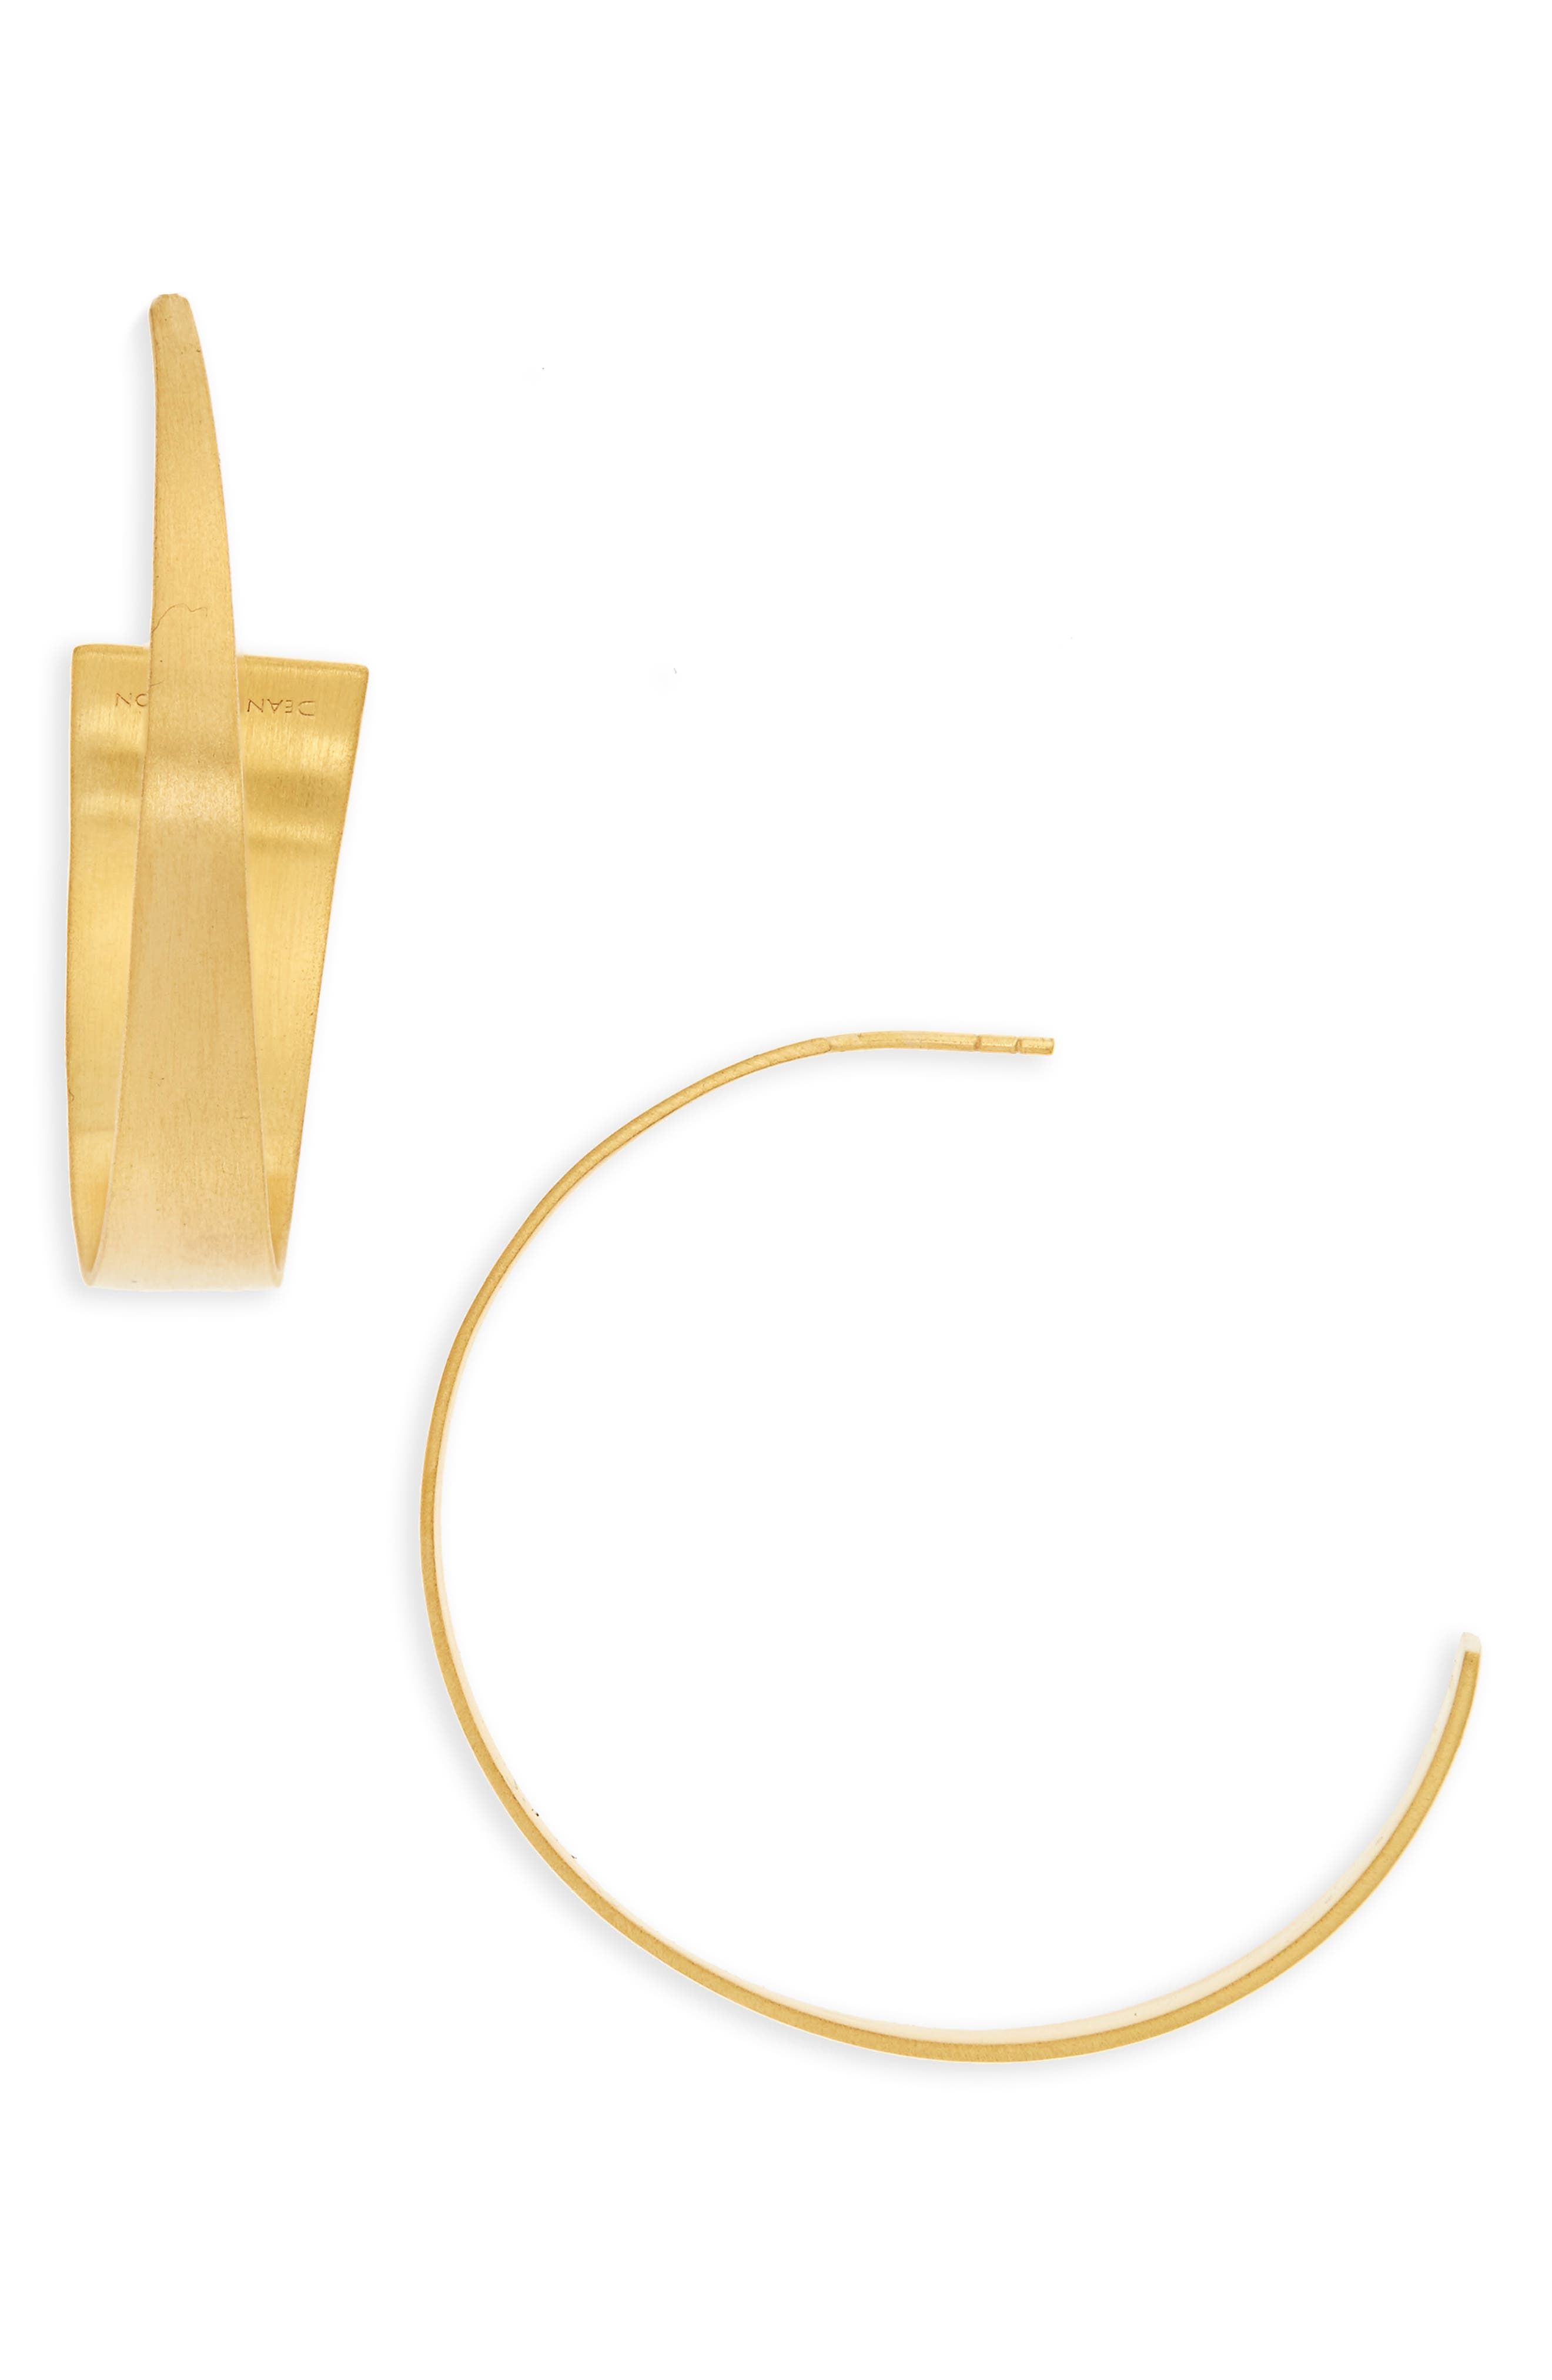 Alternate Image 1 Selected - Dean Davidson Bossa Hoop Earrings